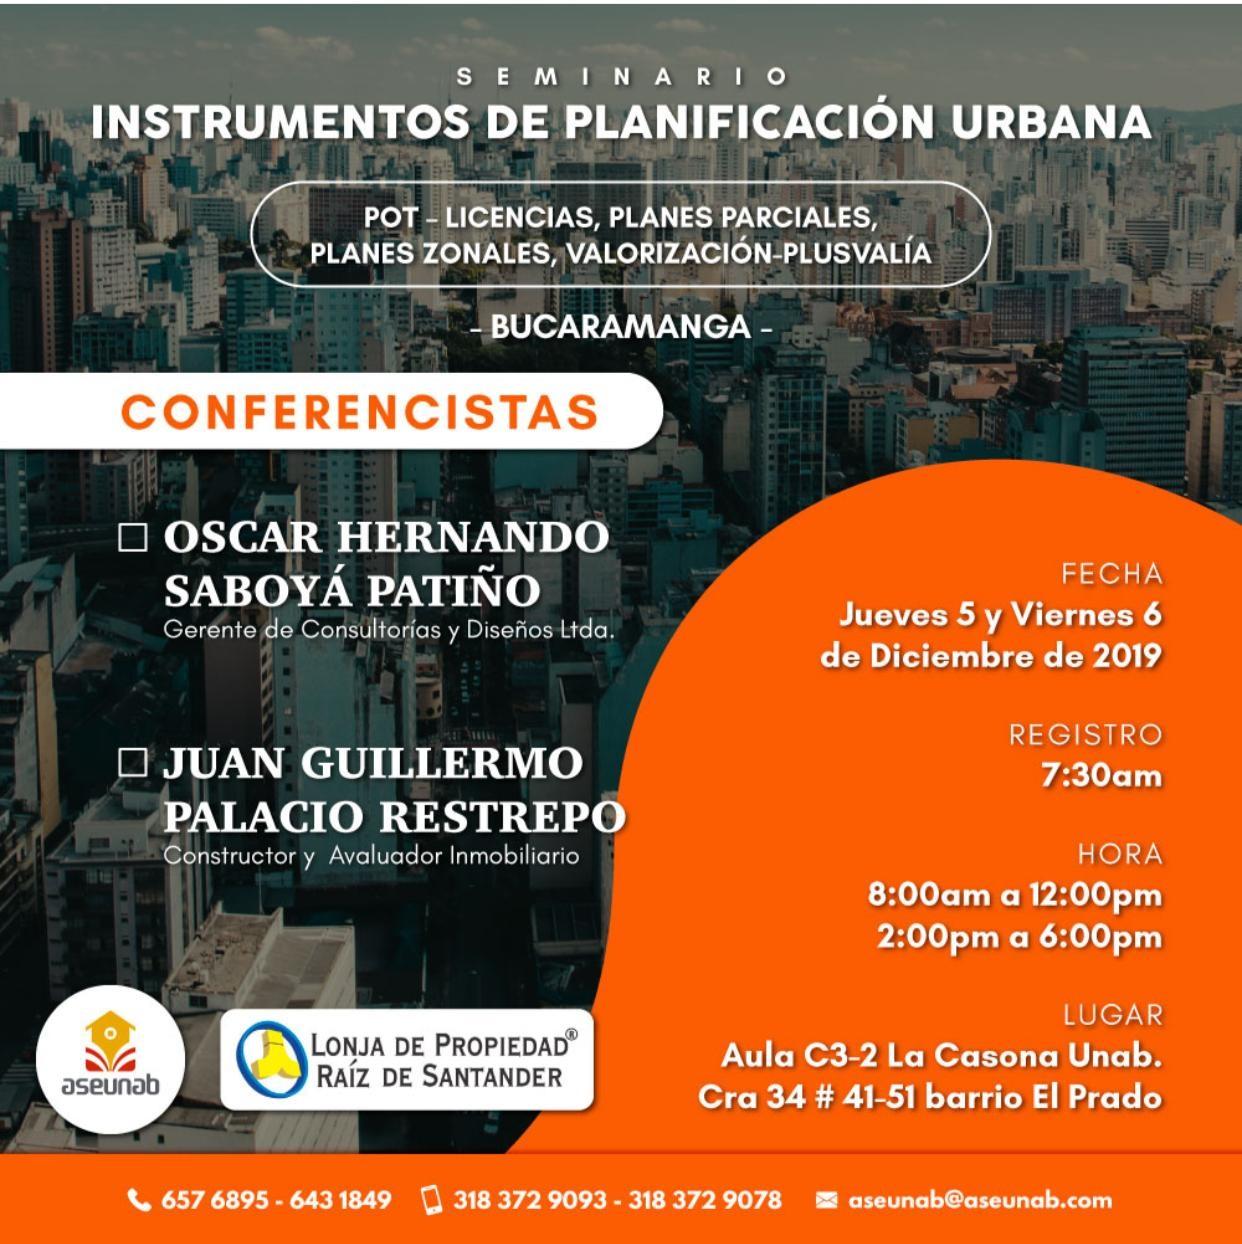 Seminario: Instrumentos de Planificación Urbana